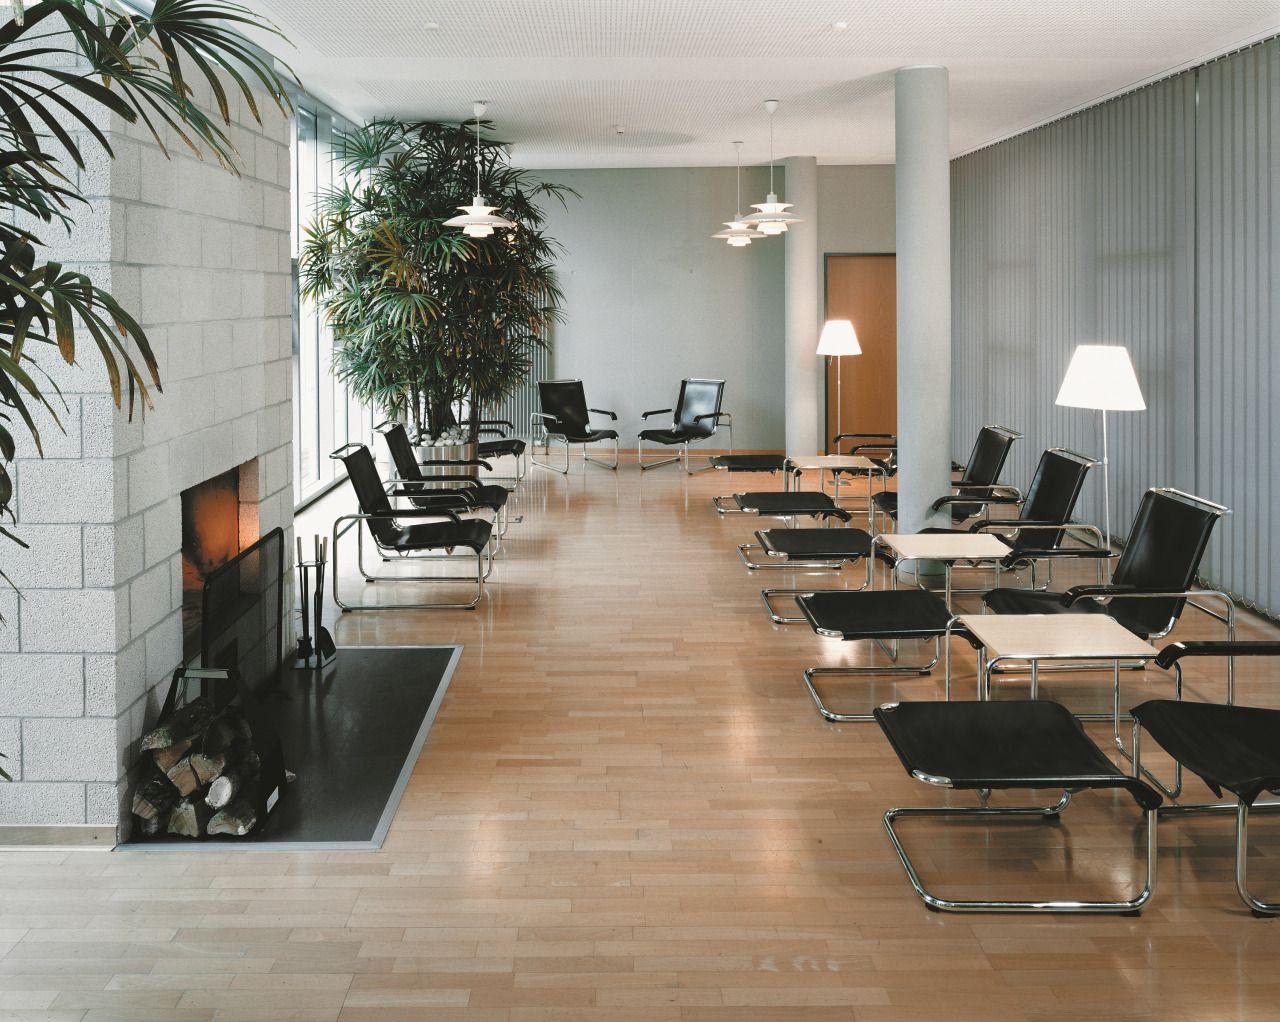 THONETNESTING TABLE B9a/b/c/d Pure Materials Collection Walnut #interior #bauhaus #design #modern #inspiration #thonet #furniture #cantilever #chair #lounge